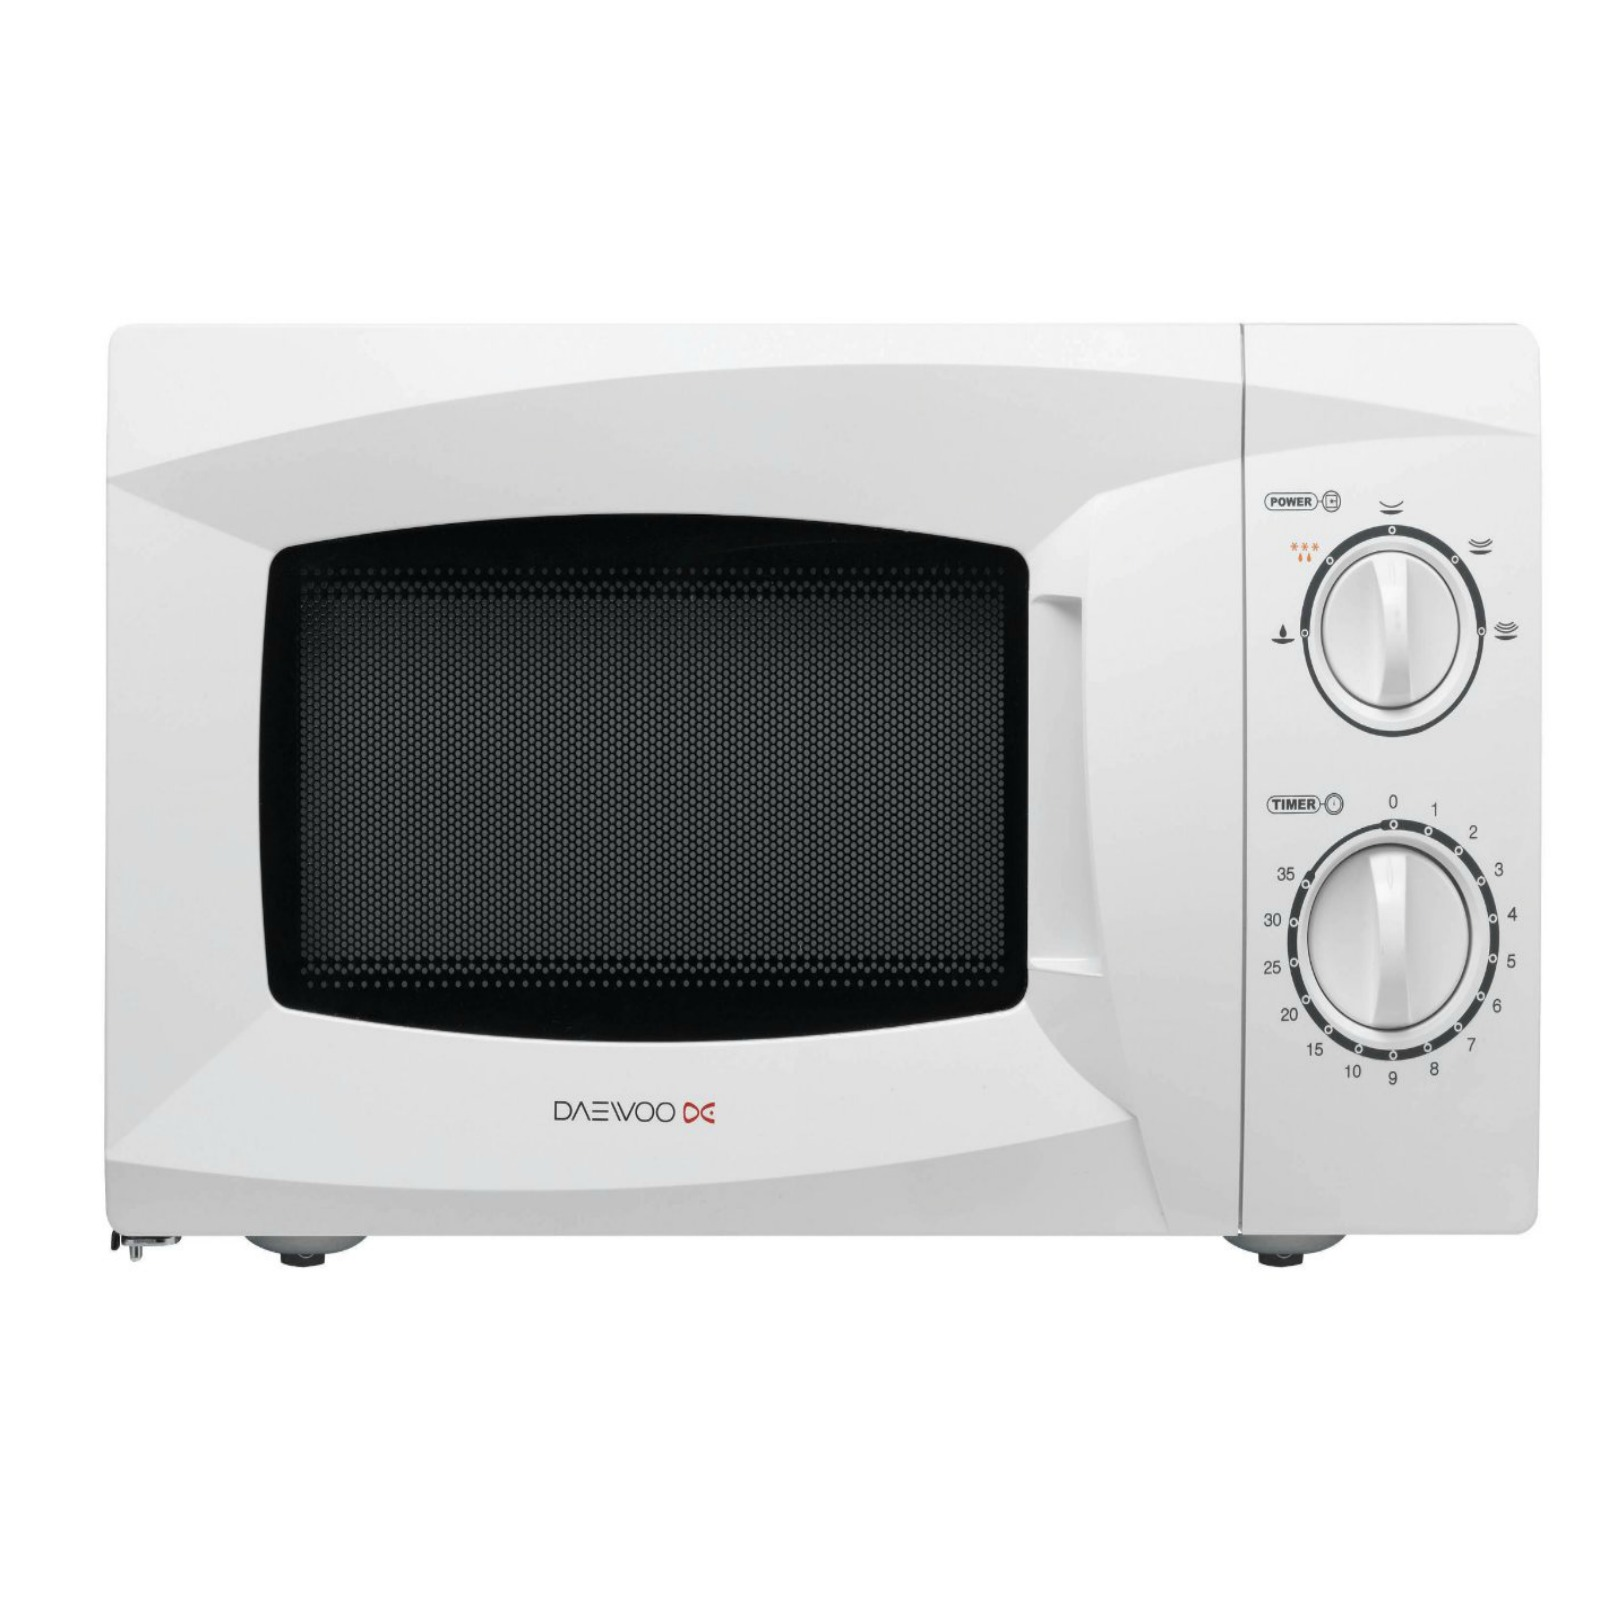 daewoo kor6l15 manual microwave 800 watt 20 l white new. Black Bedroom Furniture Sets. Home Design Ideas